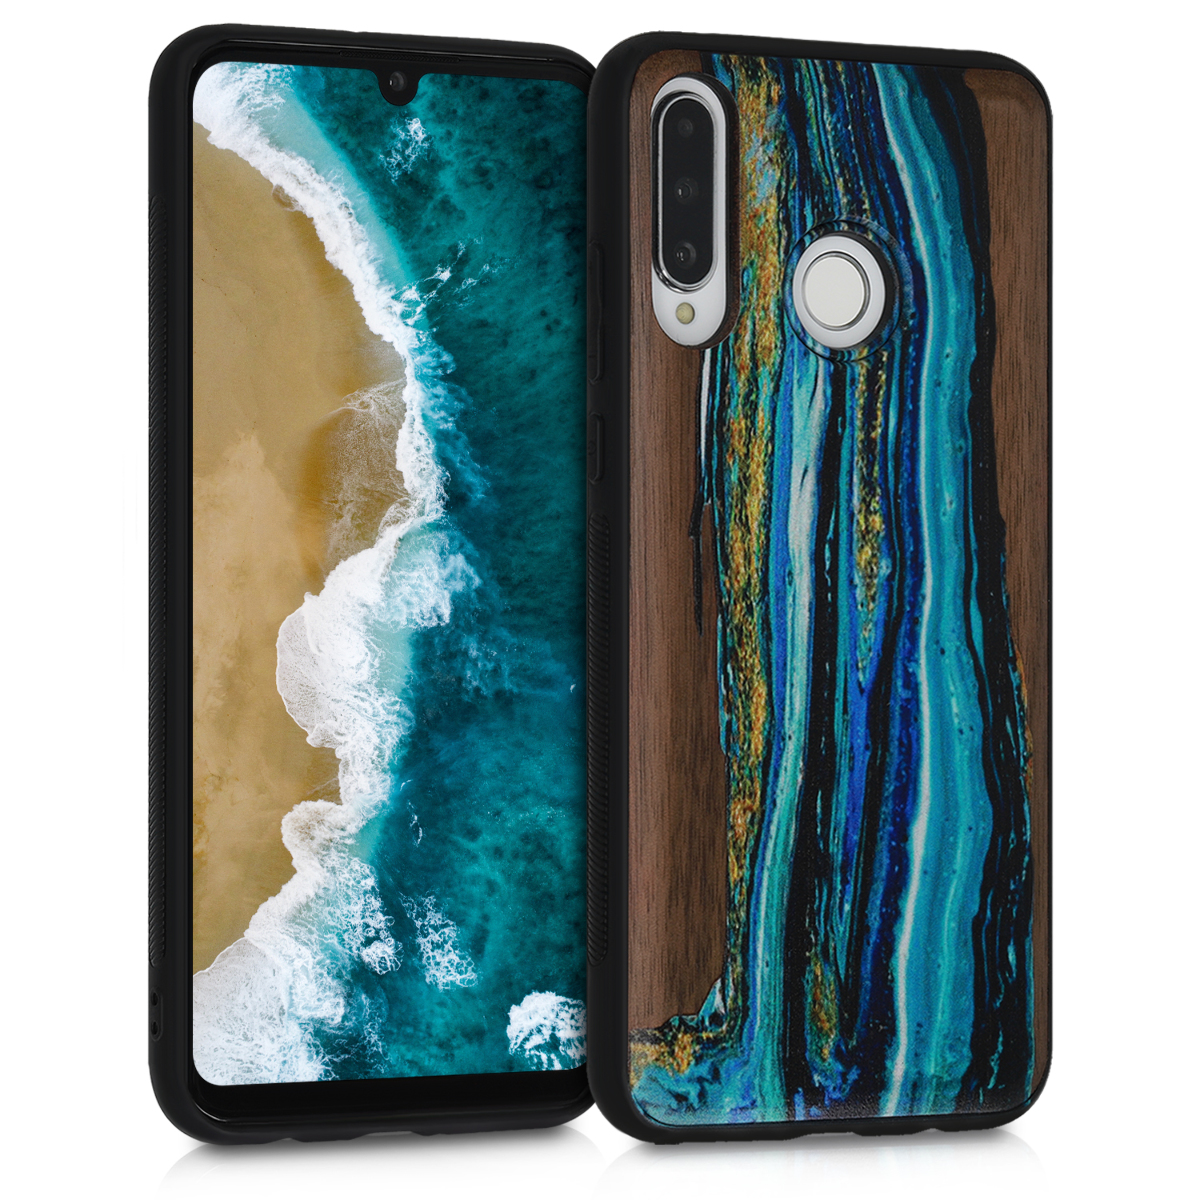 KW Ξύλινη Θήκη Huawei P30 Lite - Watercolor Waves (47506.03)